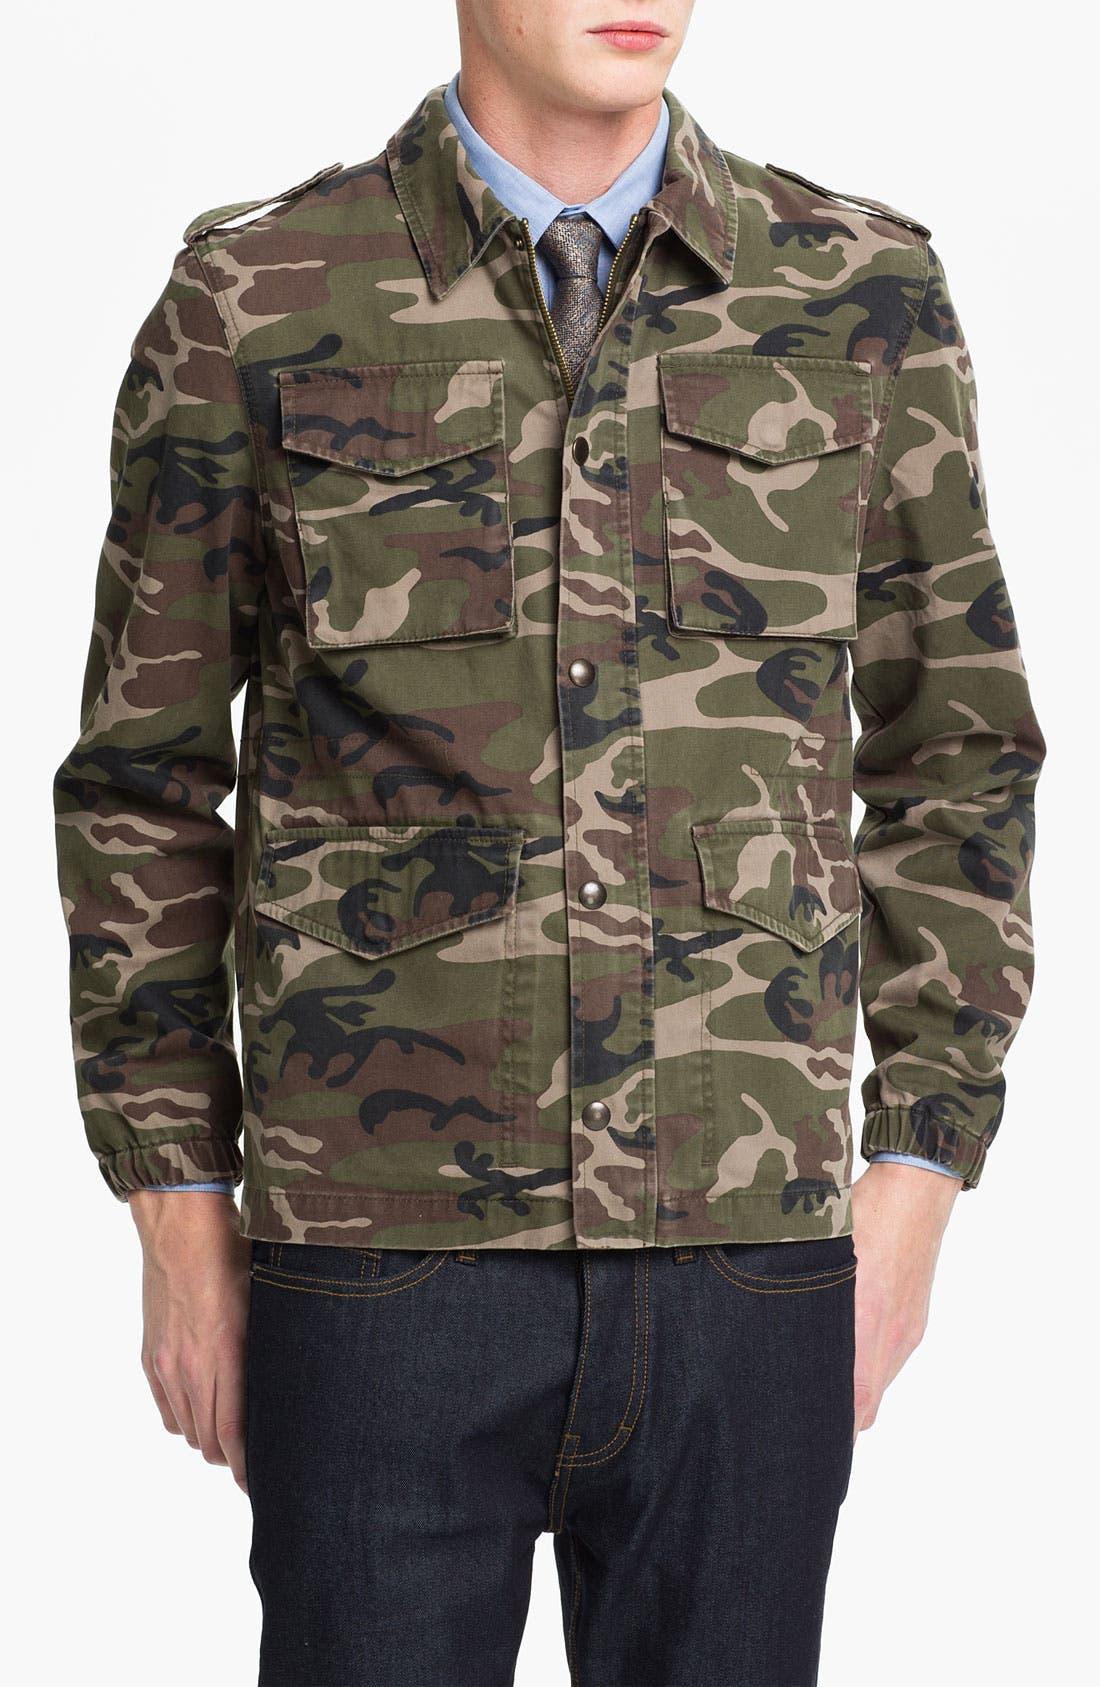 Alternate Image 1 Selected - Topman 'Blenheim' Camo Field Jacket